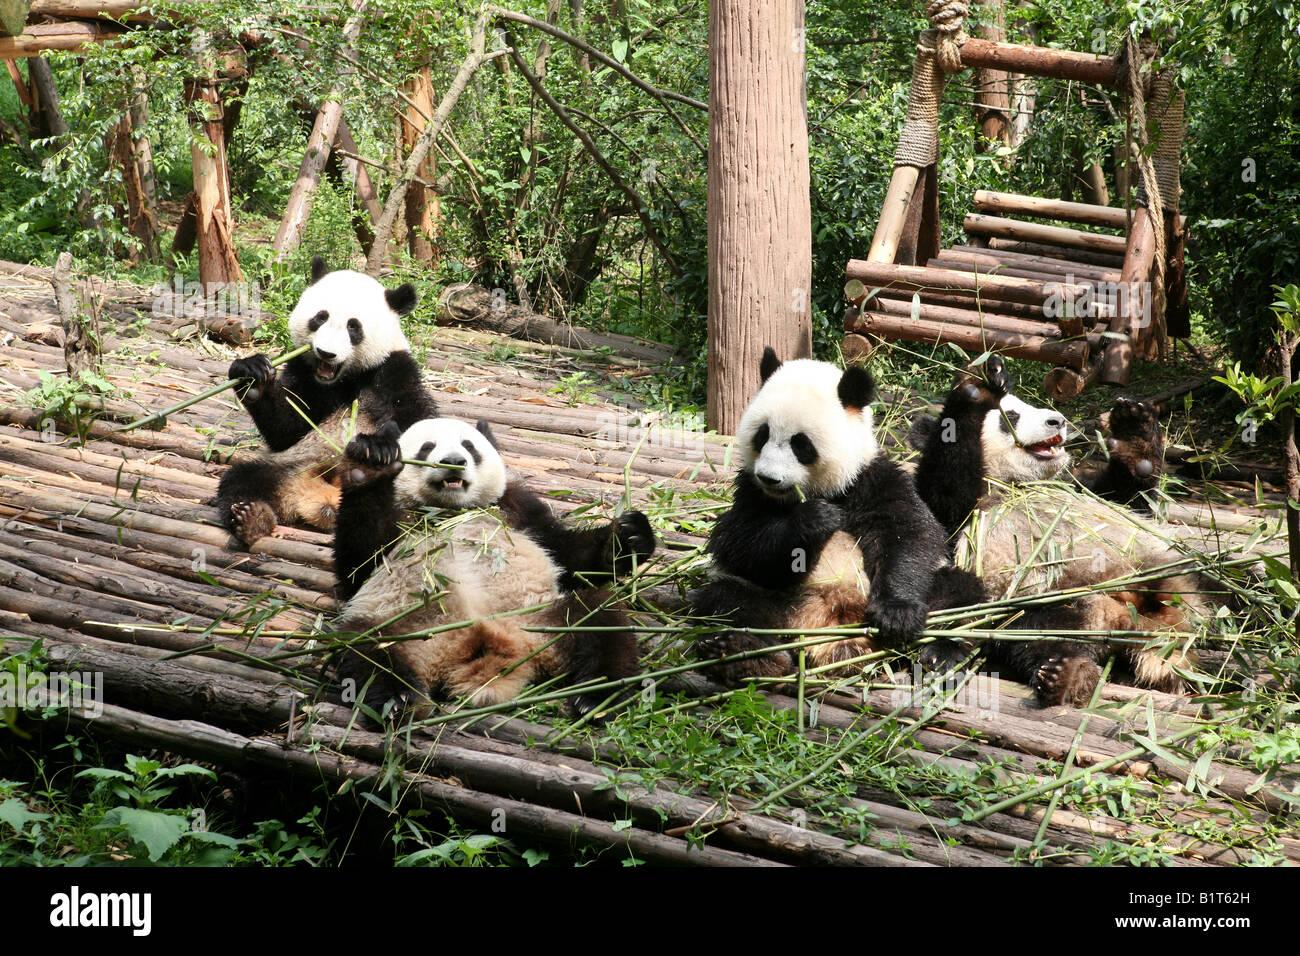 chengdu research base of giant panda breeding stockfotos chengdu research base of giant panda. Black Bedroom Furniture Sets. Home Design Ideas